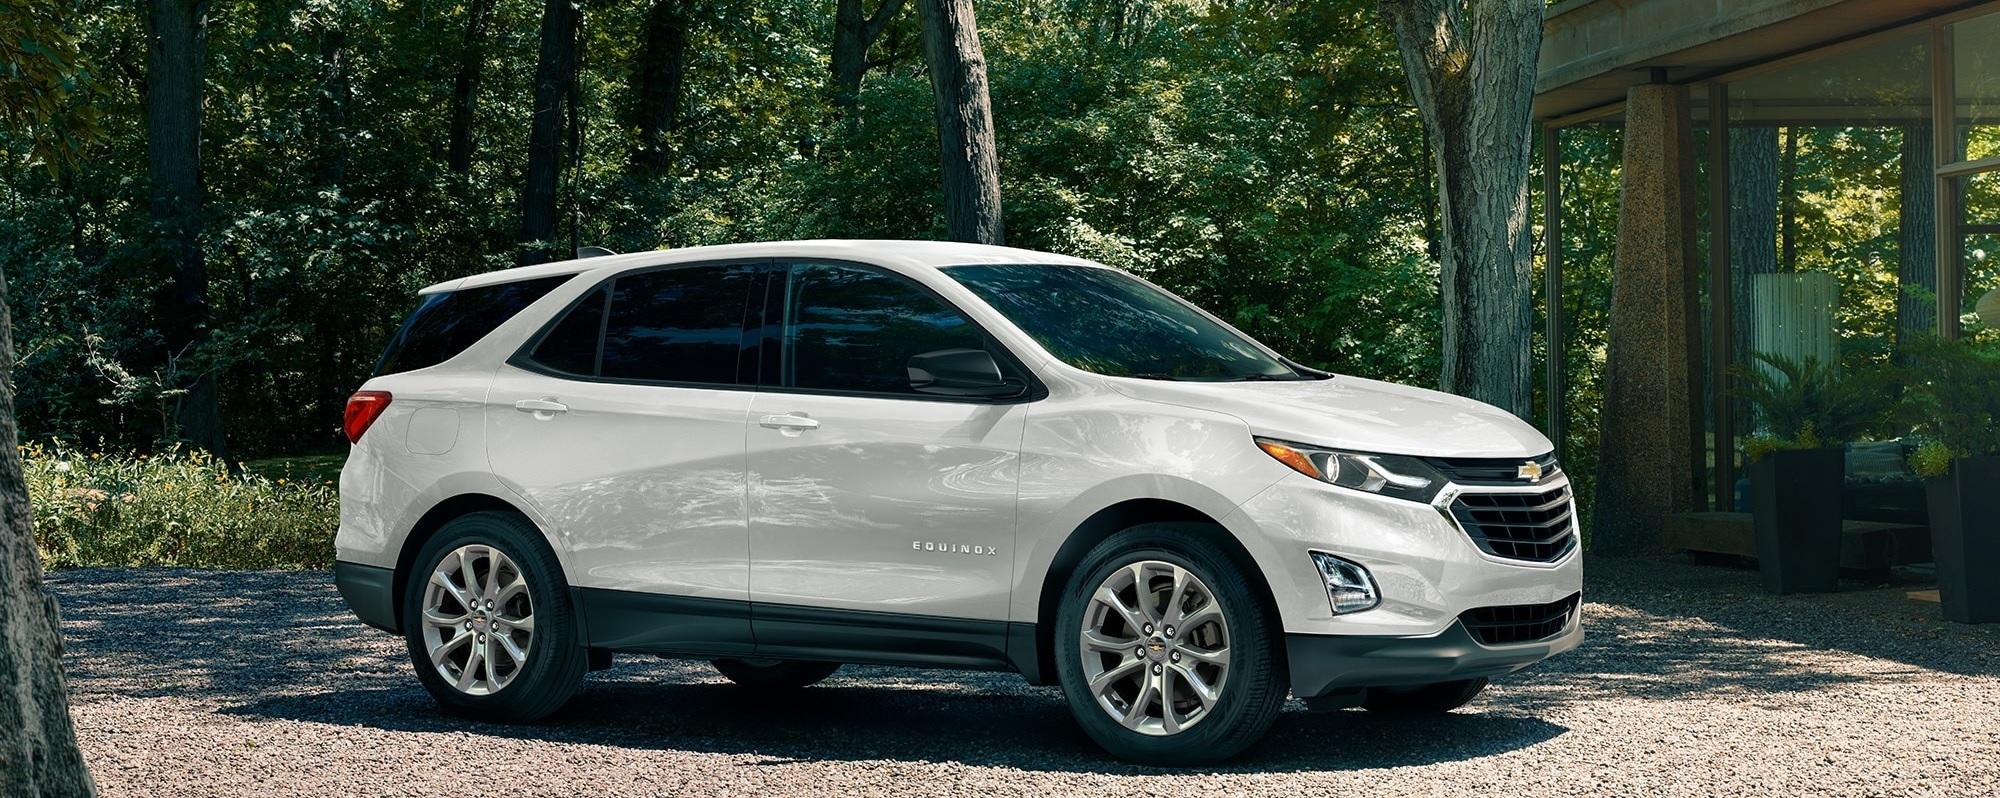 2020 Chevrolet Equinox for Sale near Huron, SD